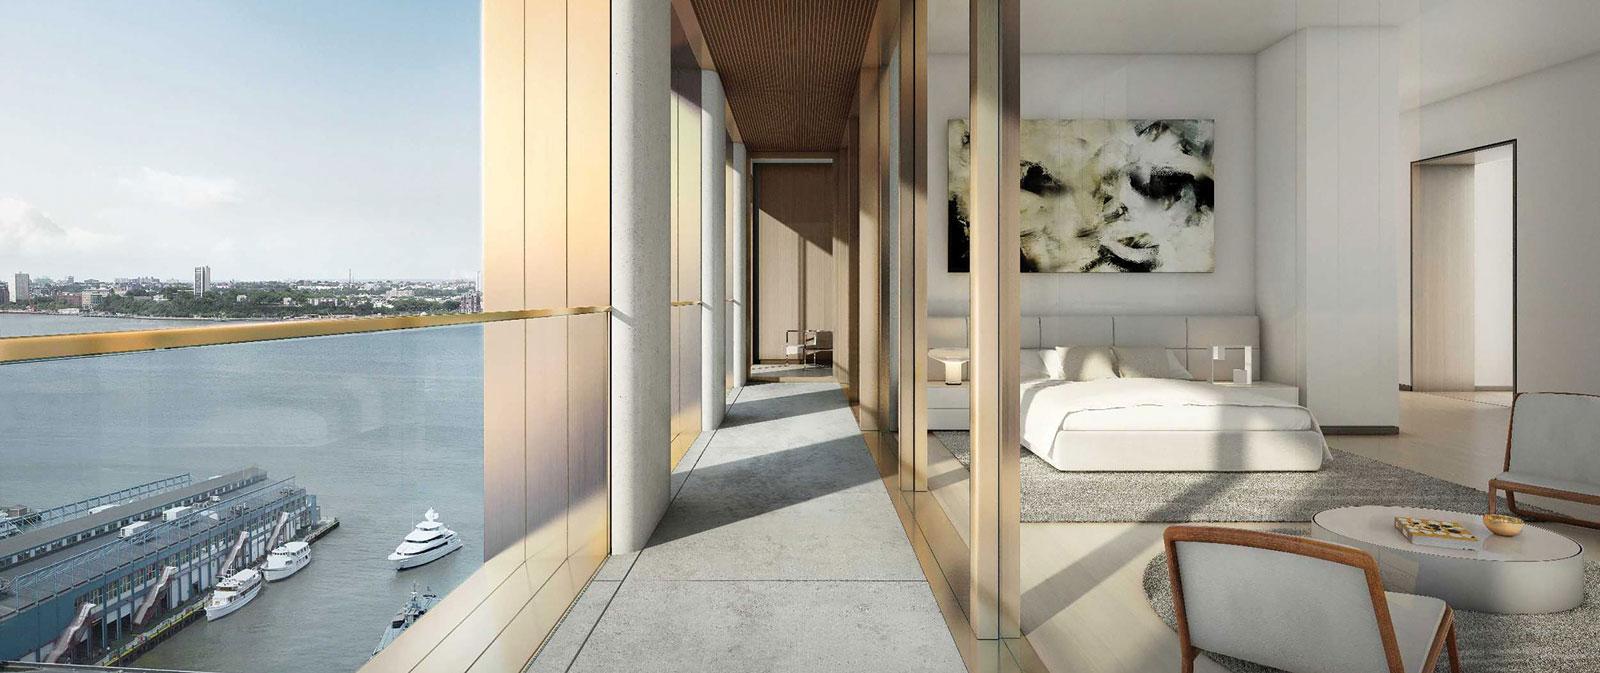 Insights on the New York City luxury market